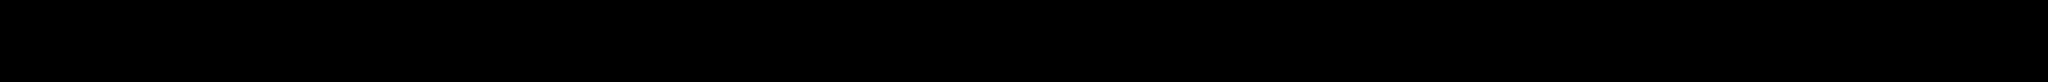 CARCOMMERCE Giubbotto catarifrangente